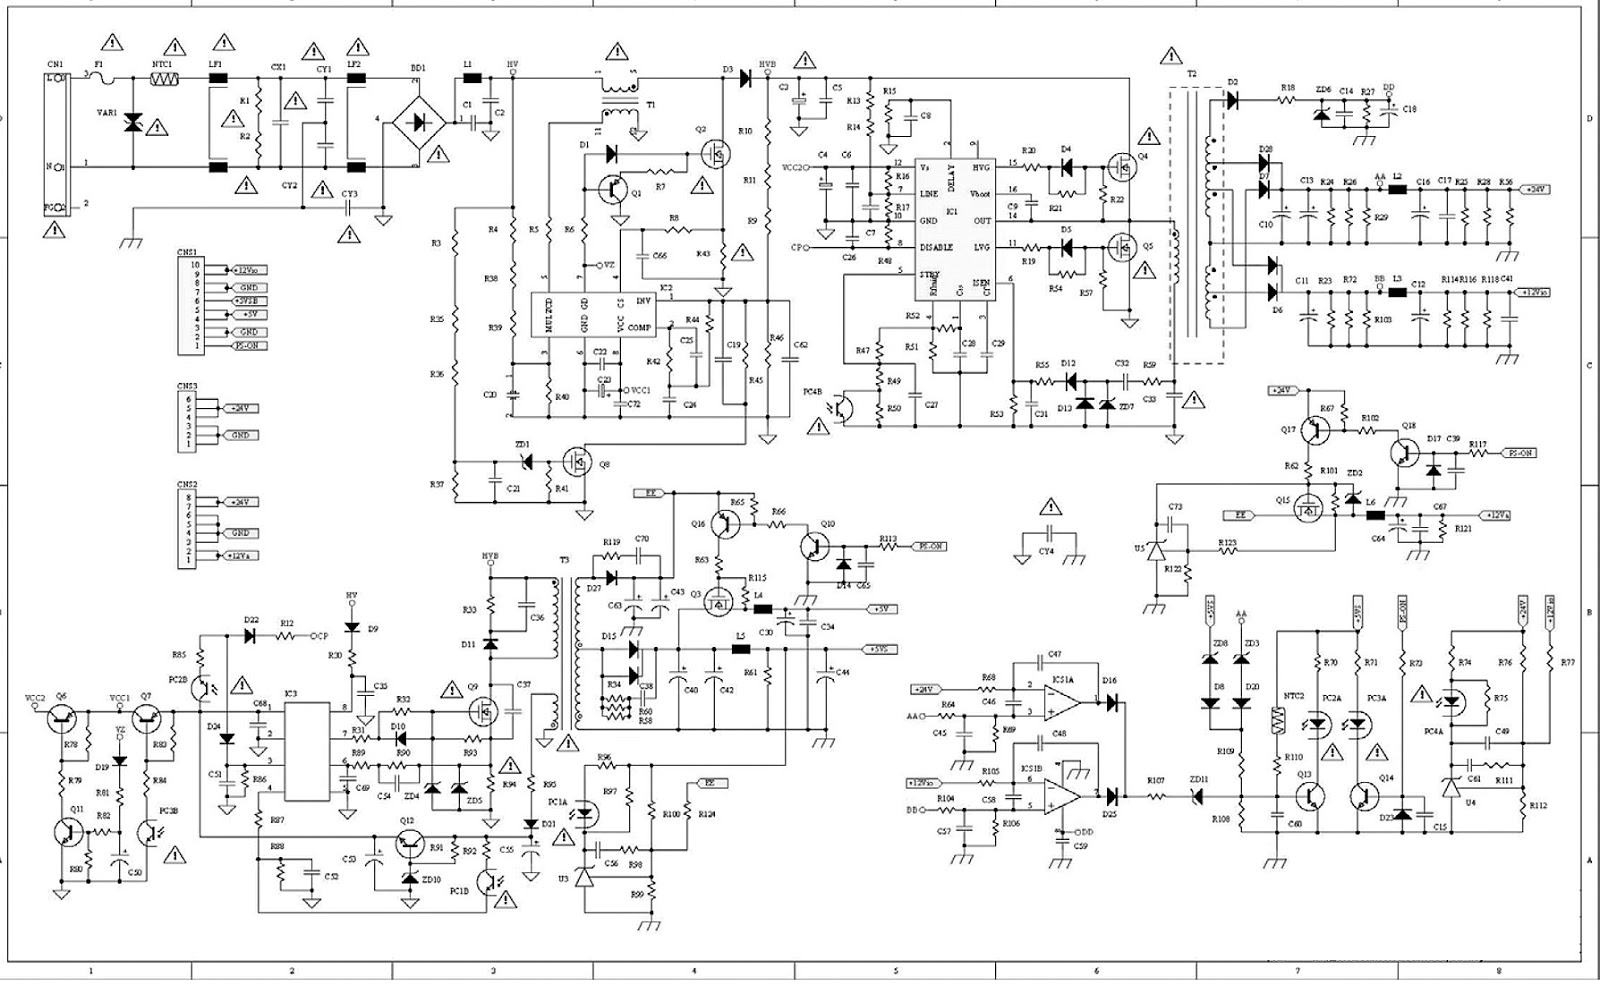 Changhong LS01 LCD TV SMPS schematic  FSP2055E01